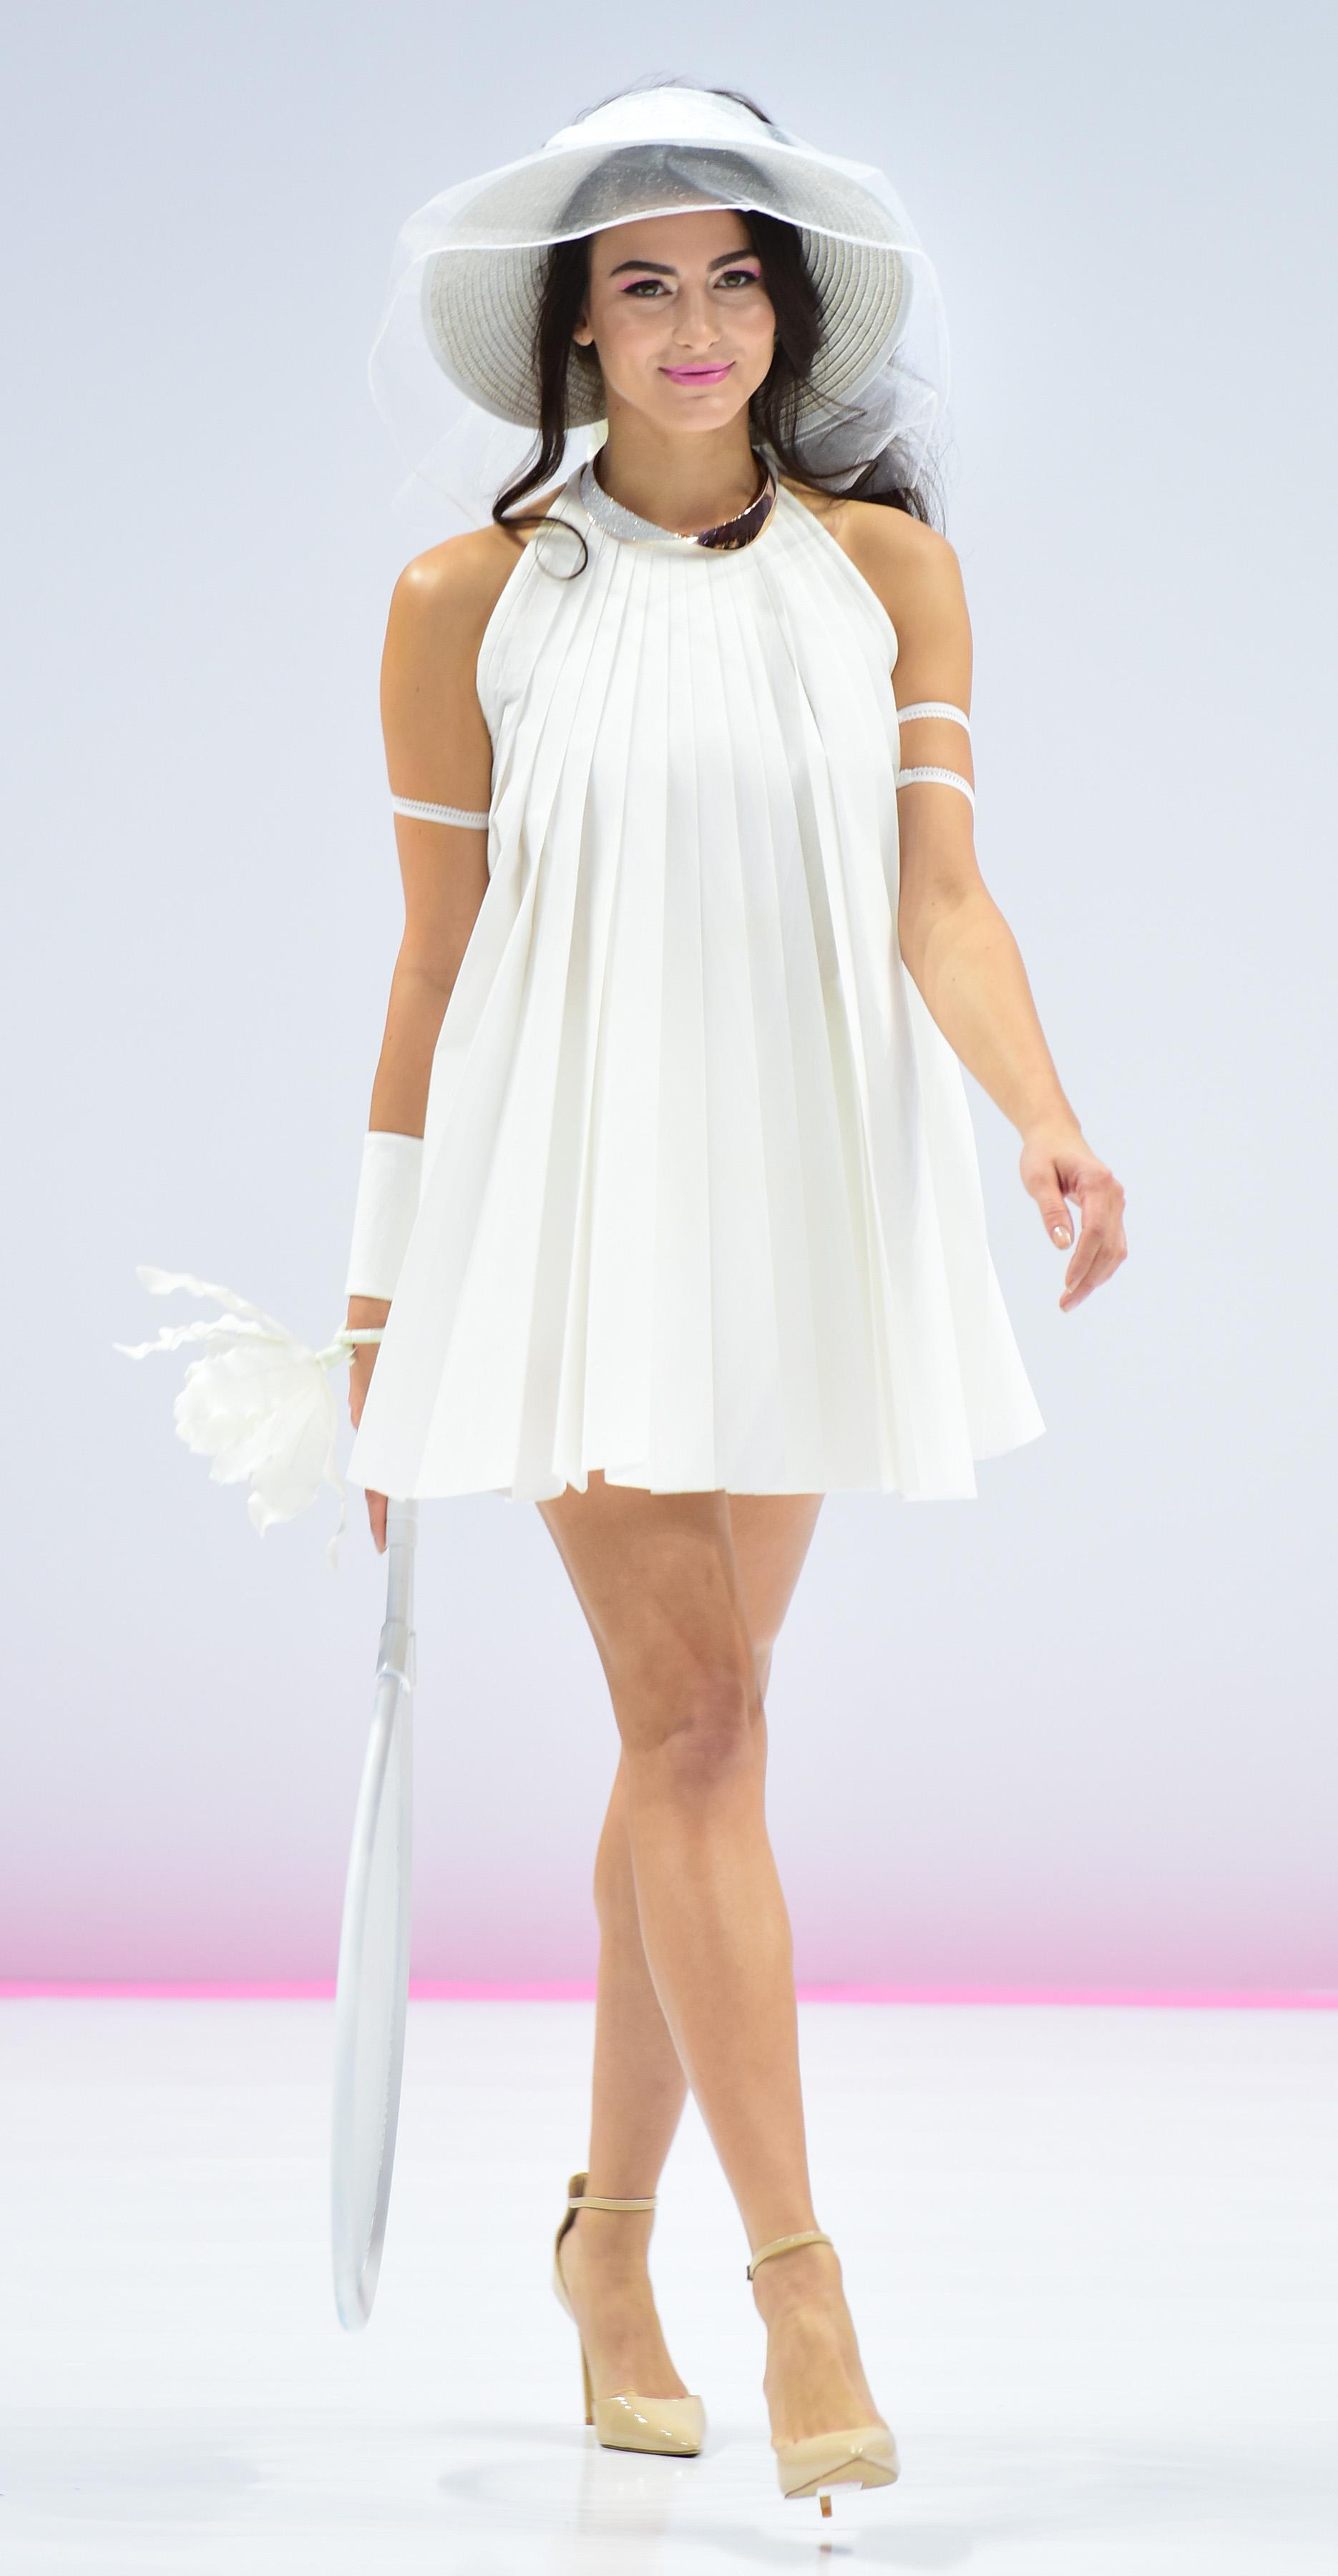 Agame Dress Up Fashion Dresses